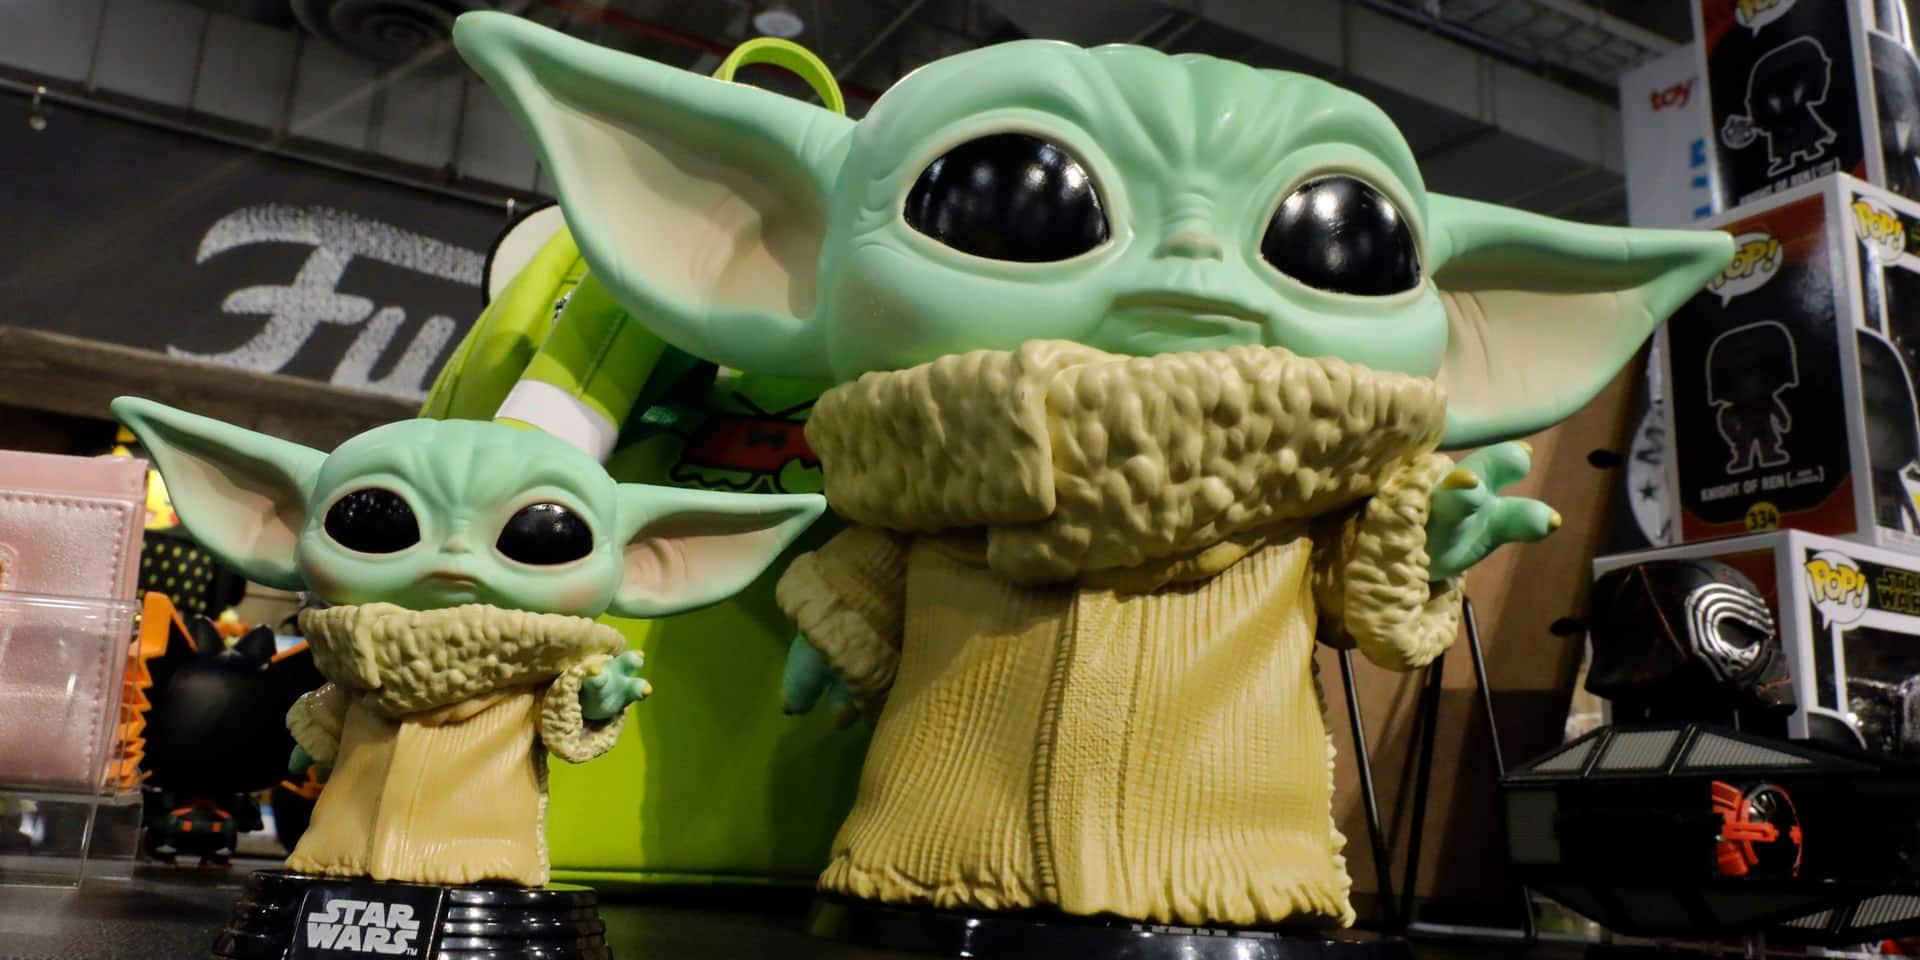 Funko's Pop! Baby Yoda